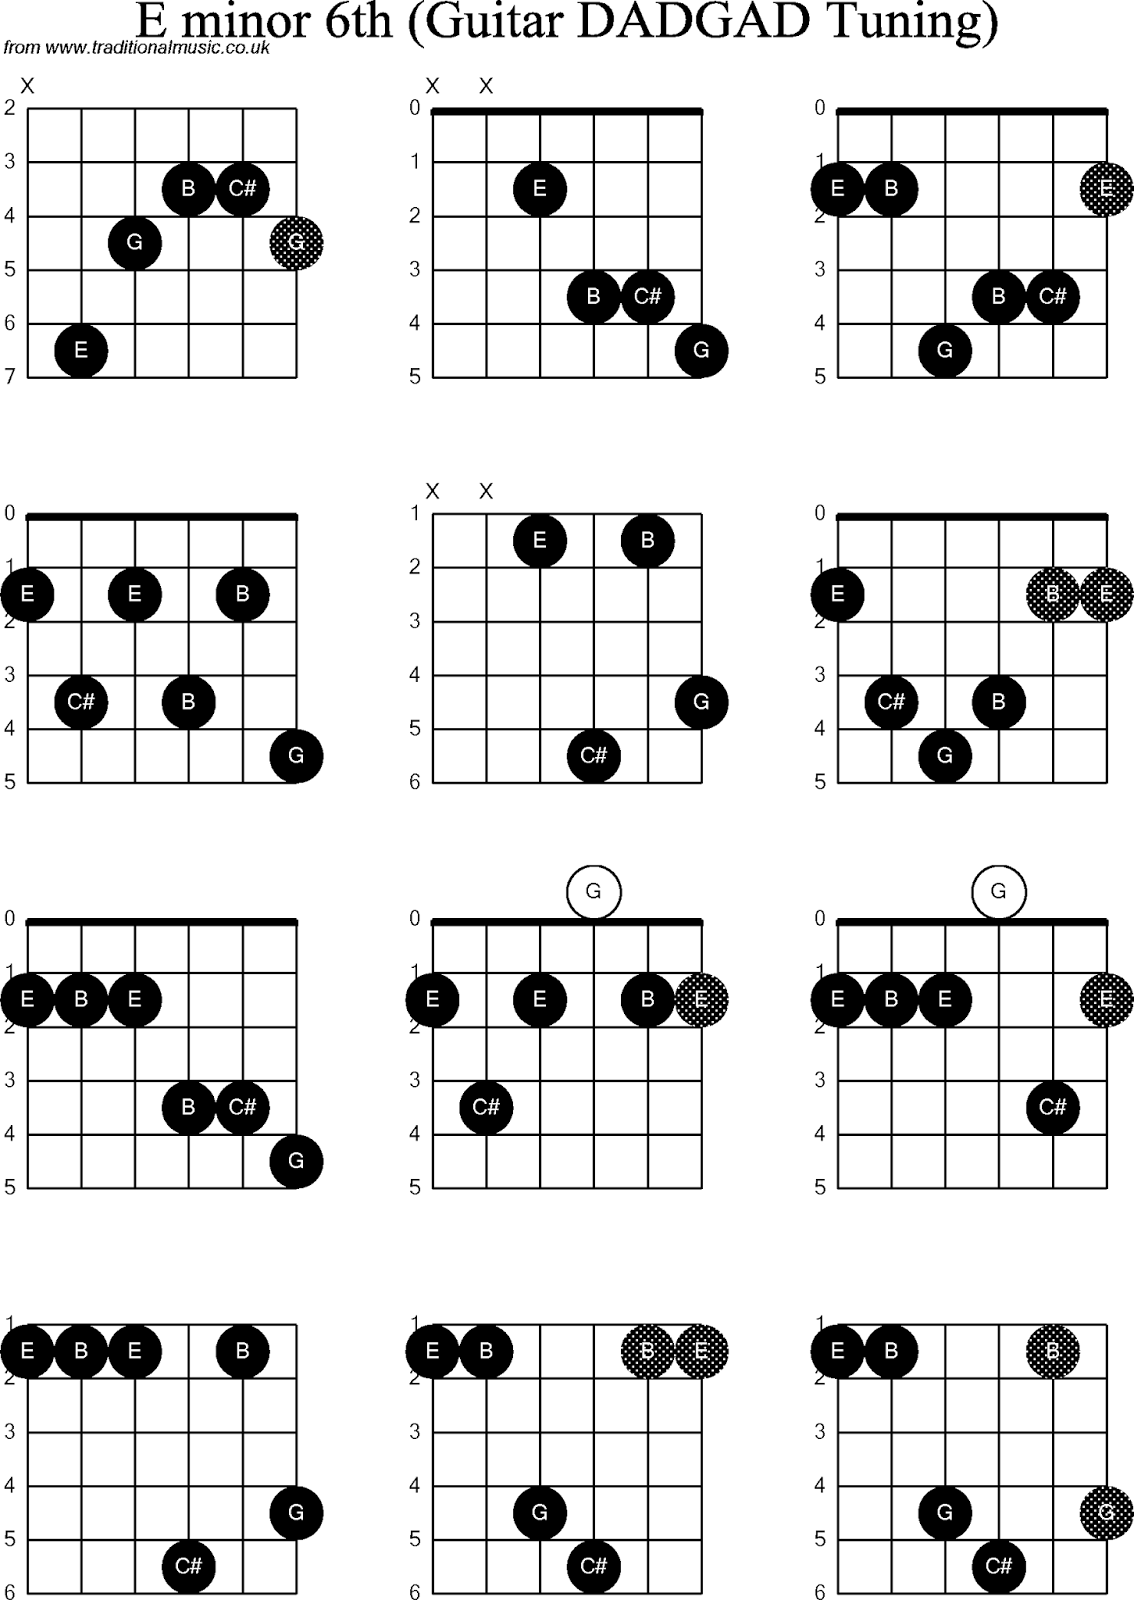 6th chords for guitar inztro. Black Bedroom Furniture Sets. Home Design Ideas